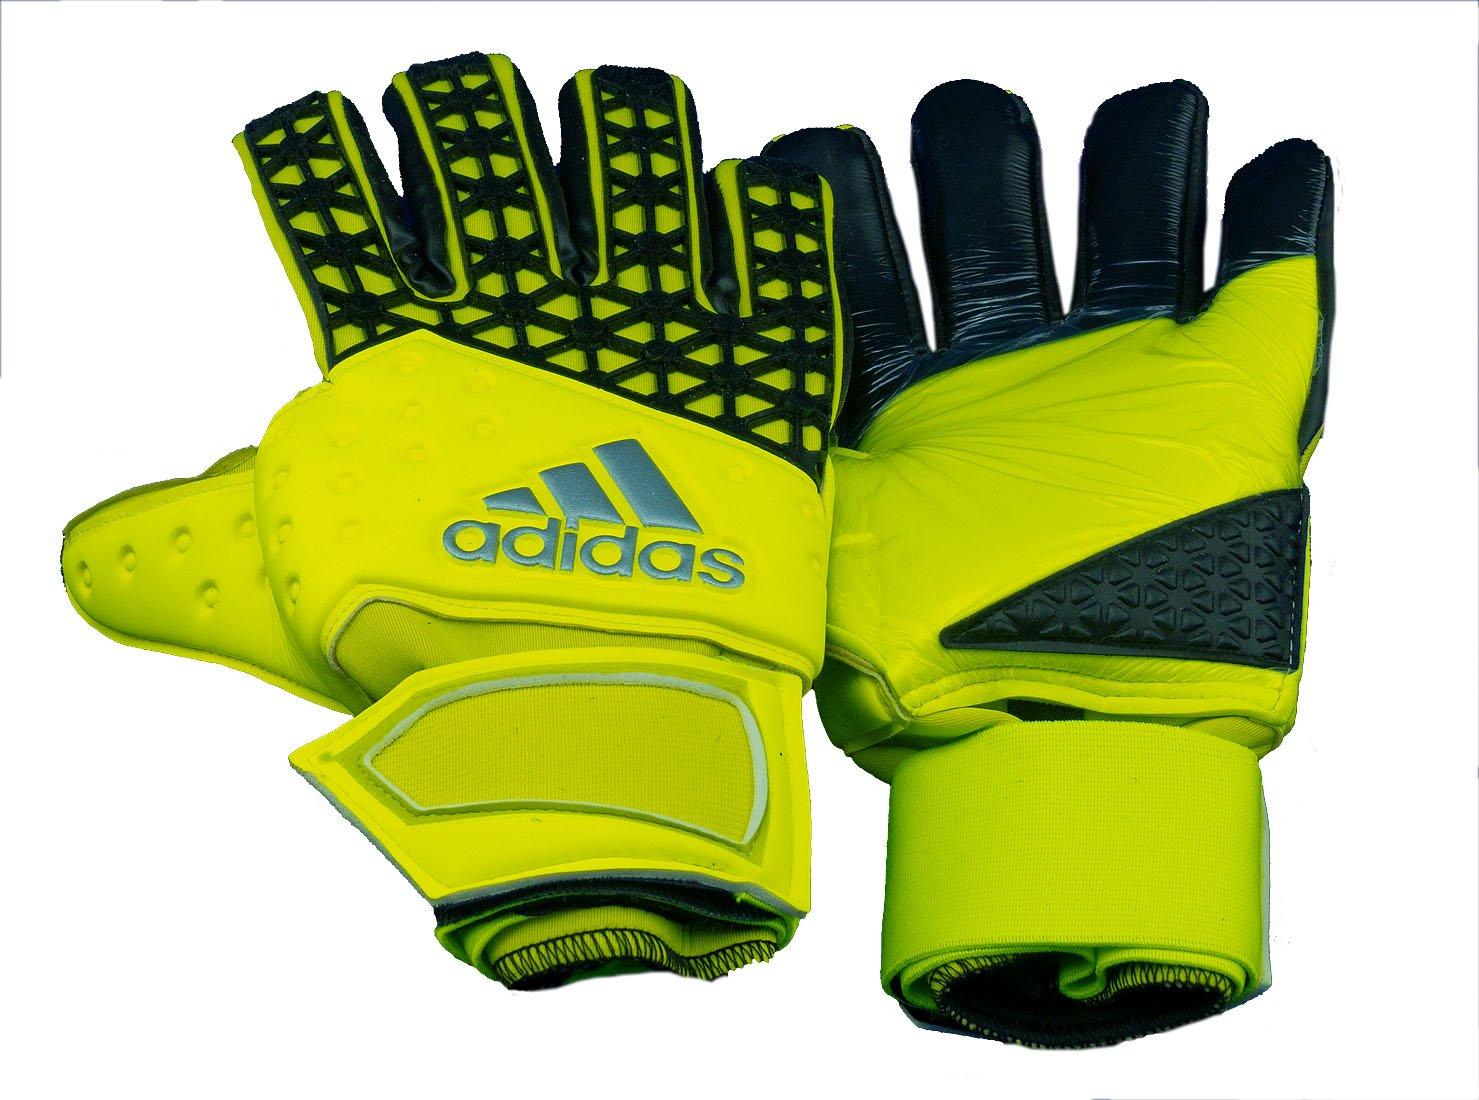 Adidas Performance Torwarthandschuhe Ace Zonen Pro Promo 10 10,5 11 Neuer Handschuhe